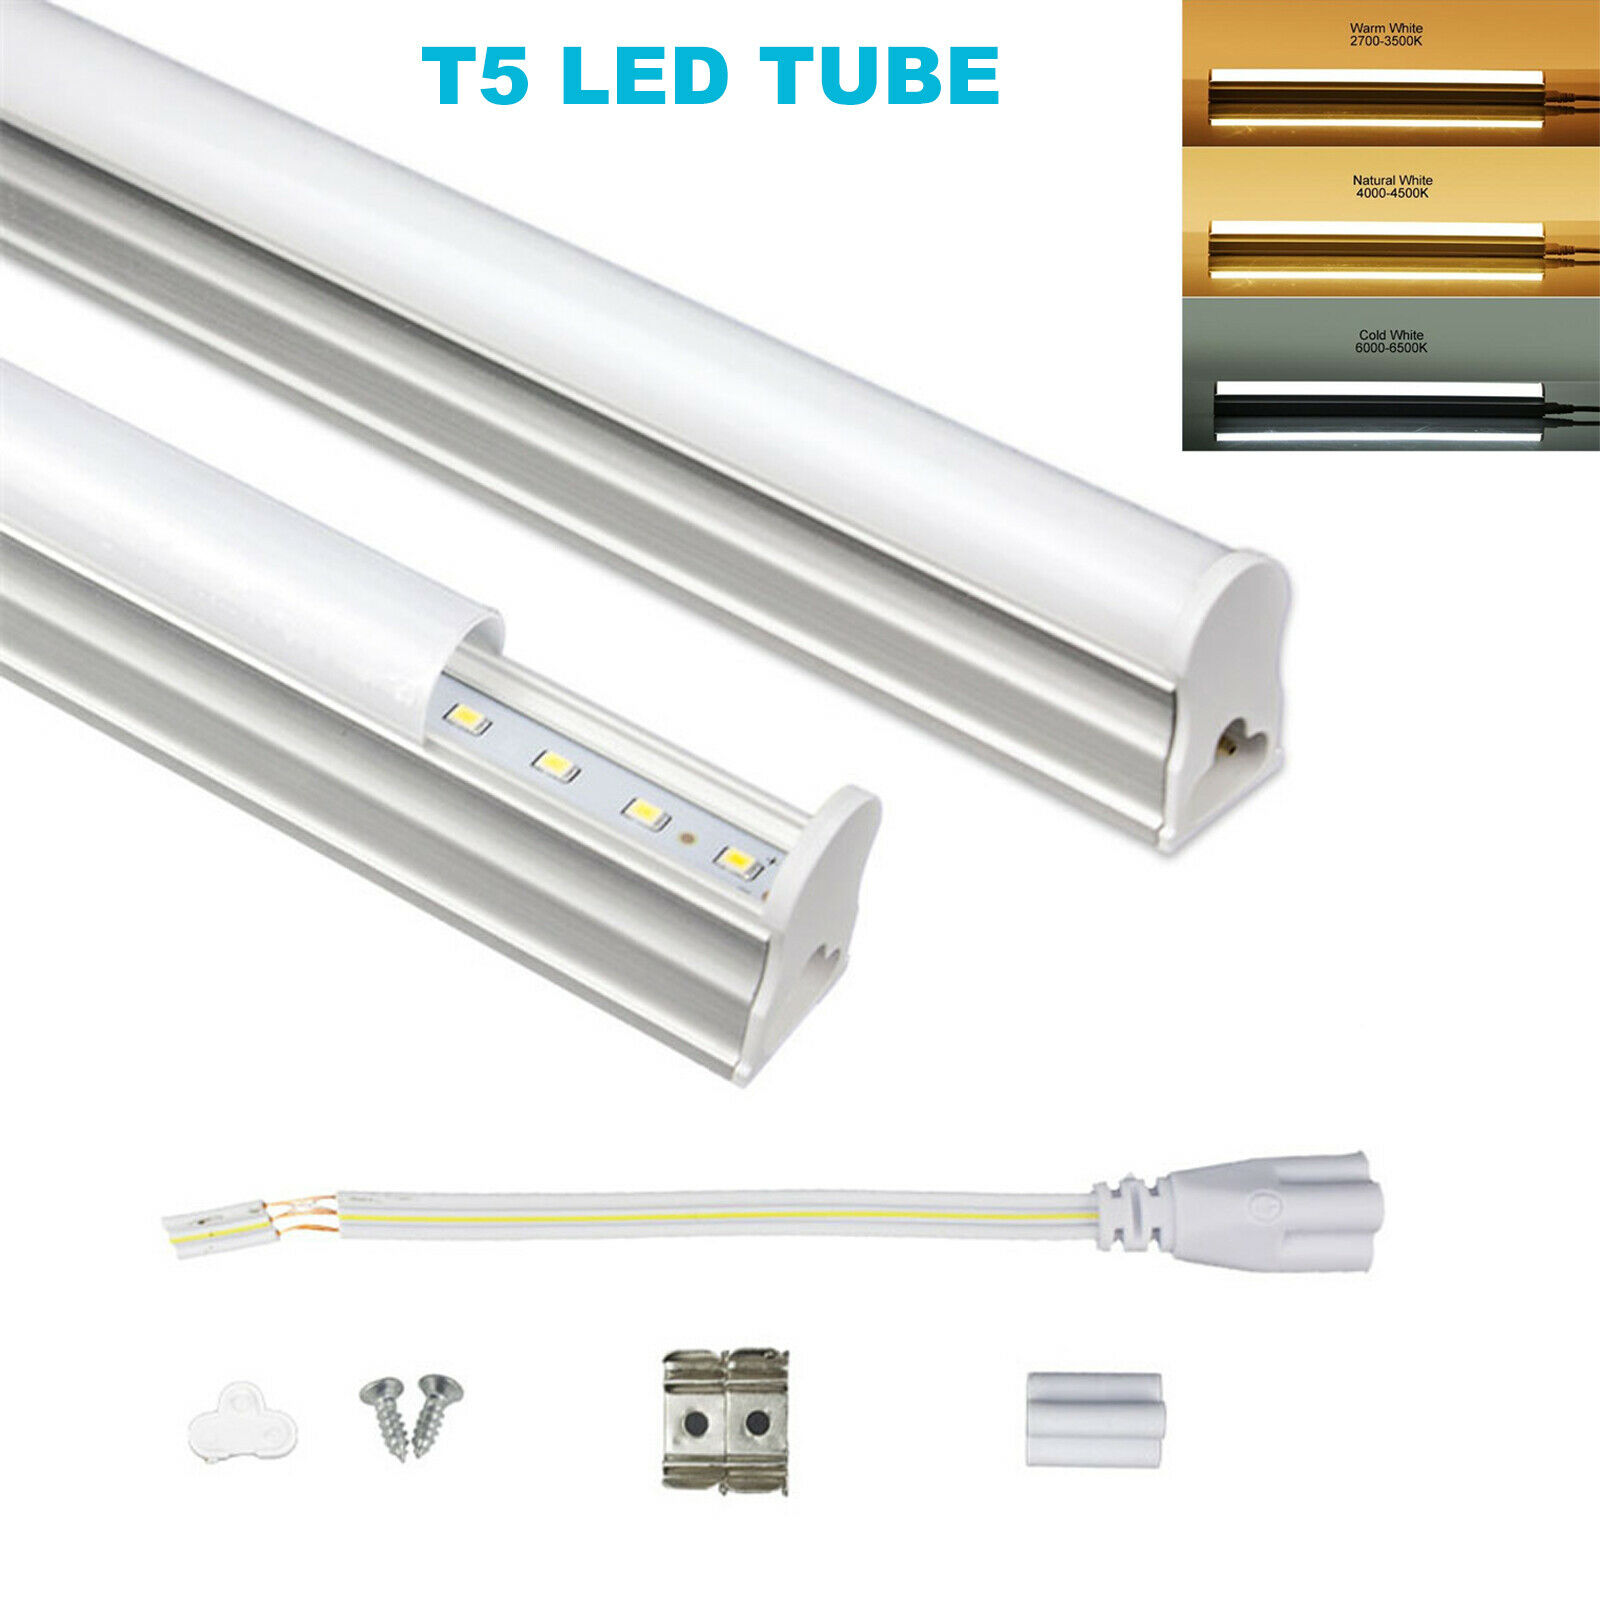 60CM 90CM 120CM T5 LED Röhr Tube Röhre Lampe Roehre Leuchtstoffröhre 9W 14W 18W